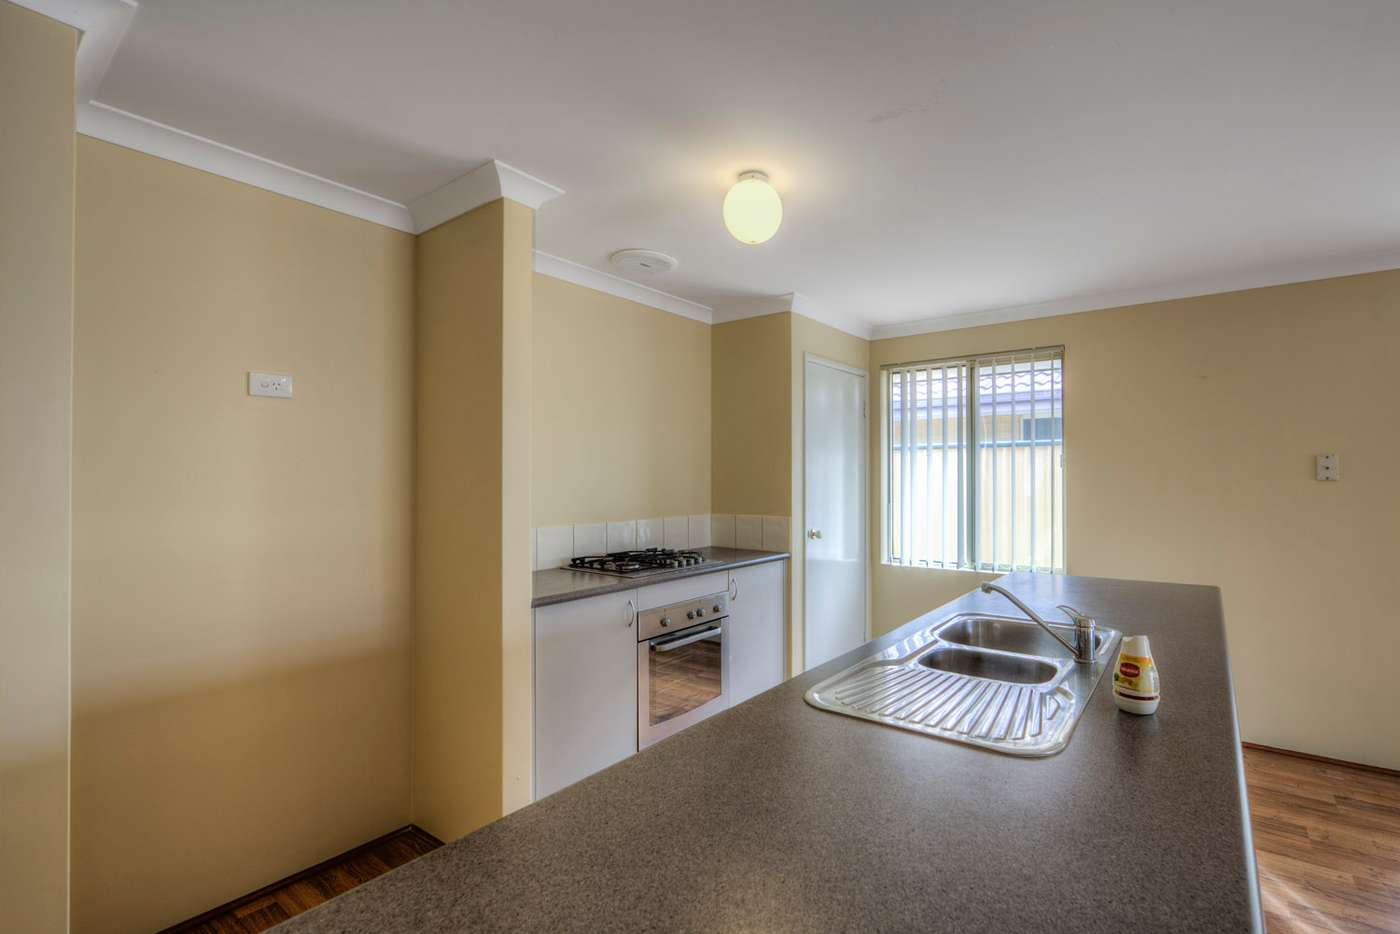 Seventh view of Homely house listing, 4 Kalbarri Avenue, Yanchep WA 6035